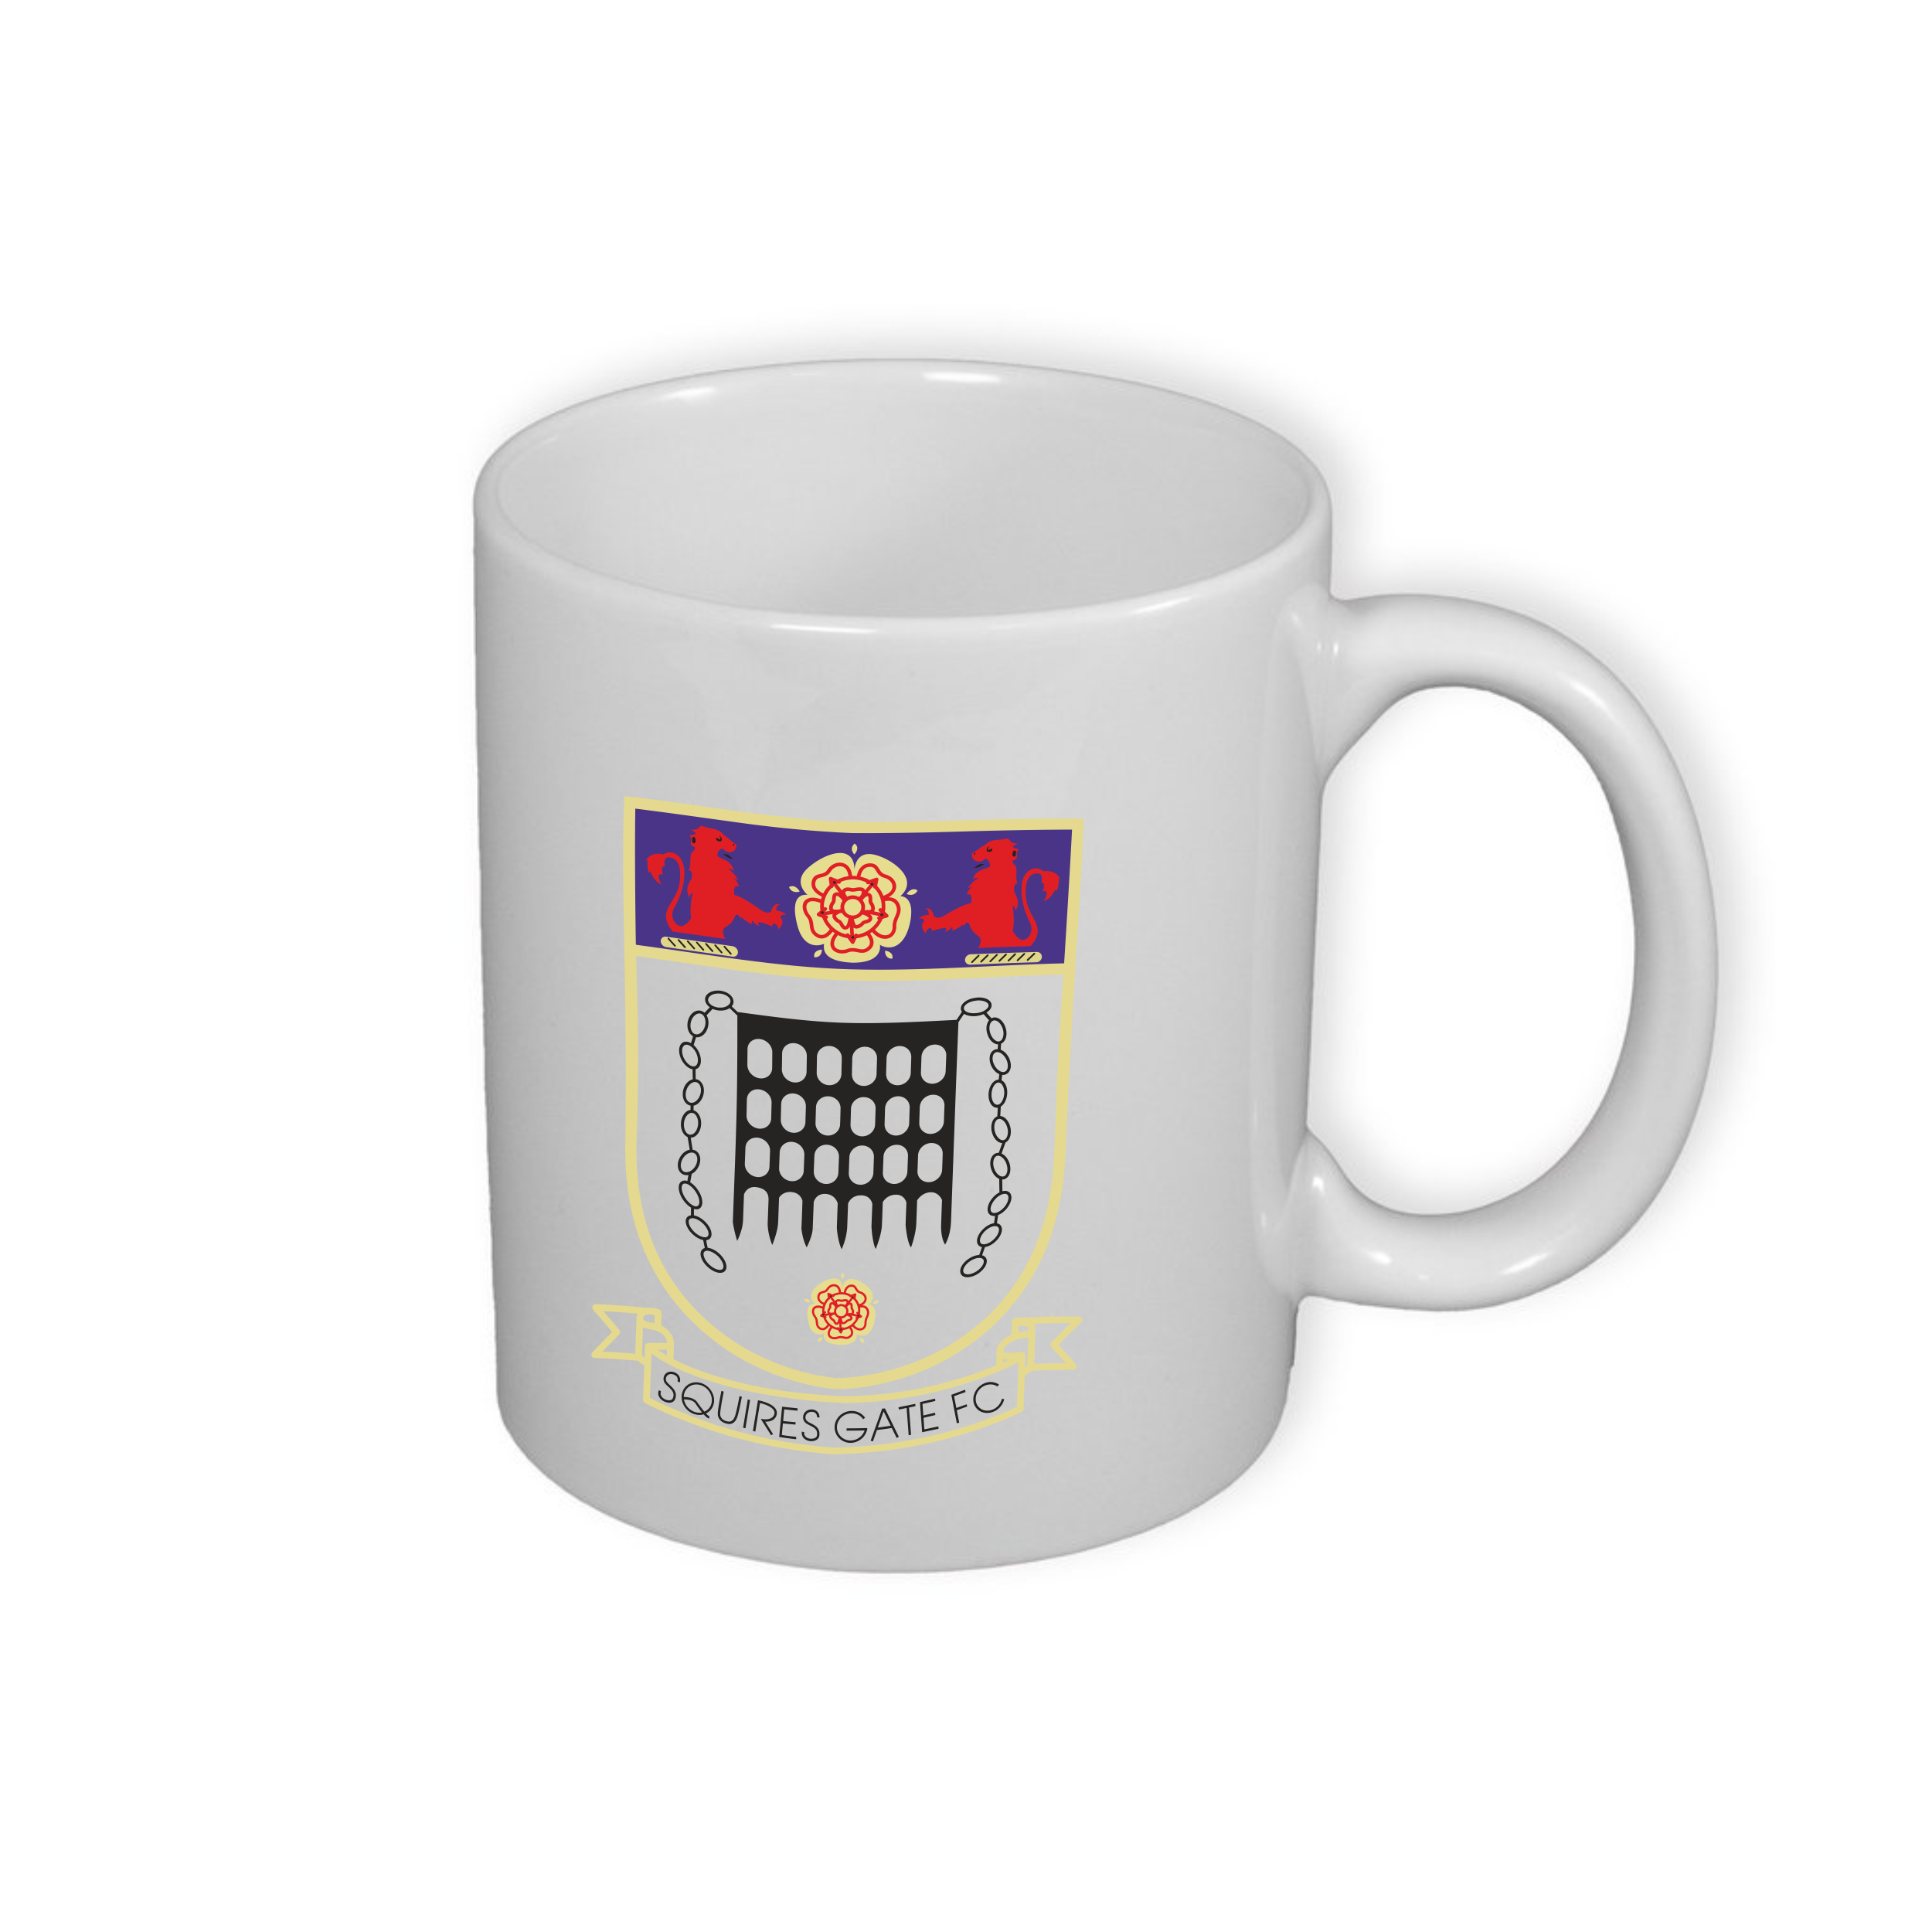 Squires Gate FC Mug